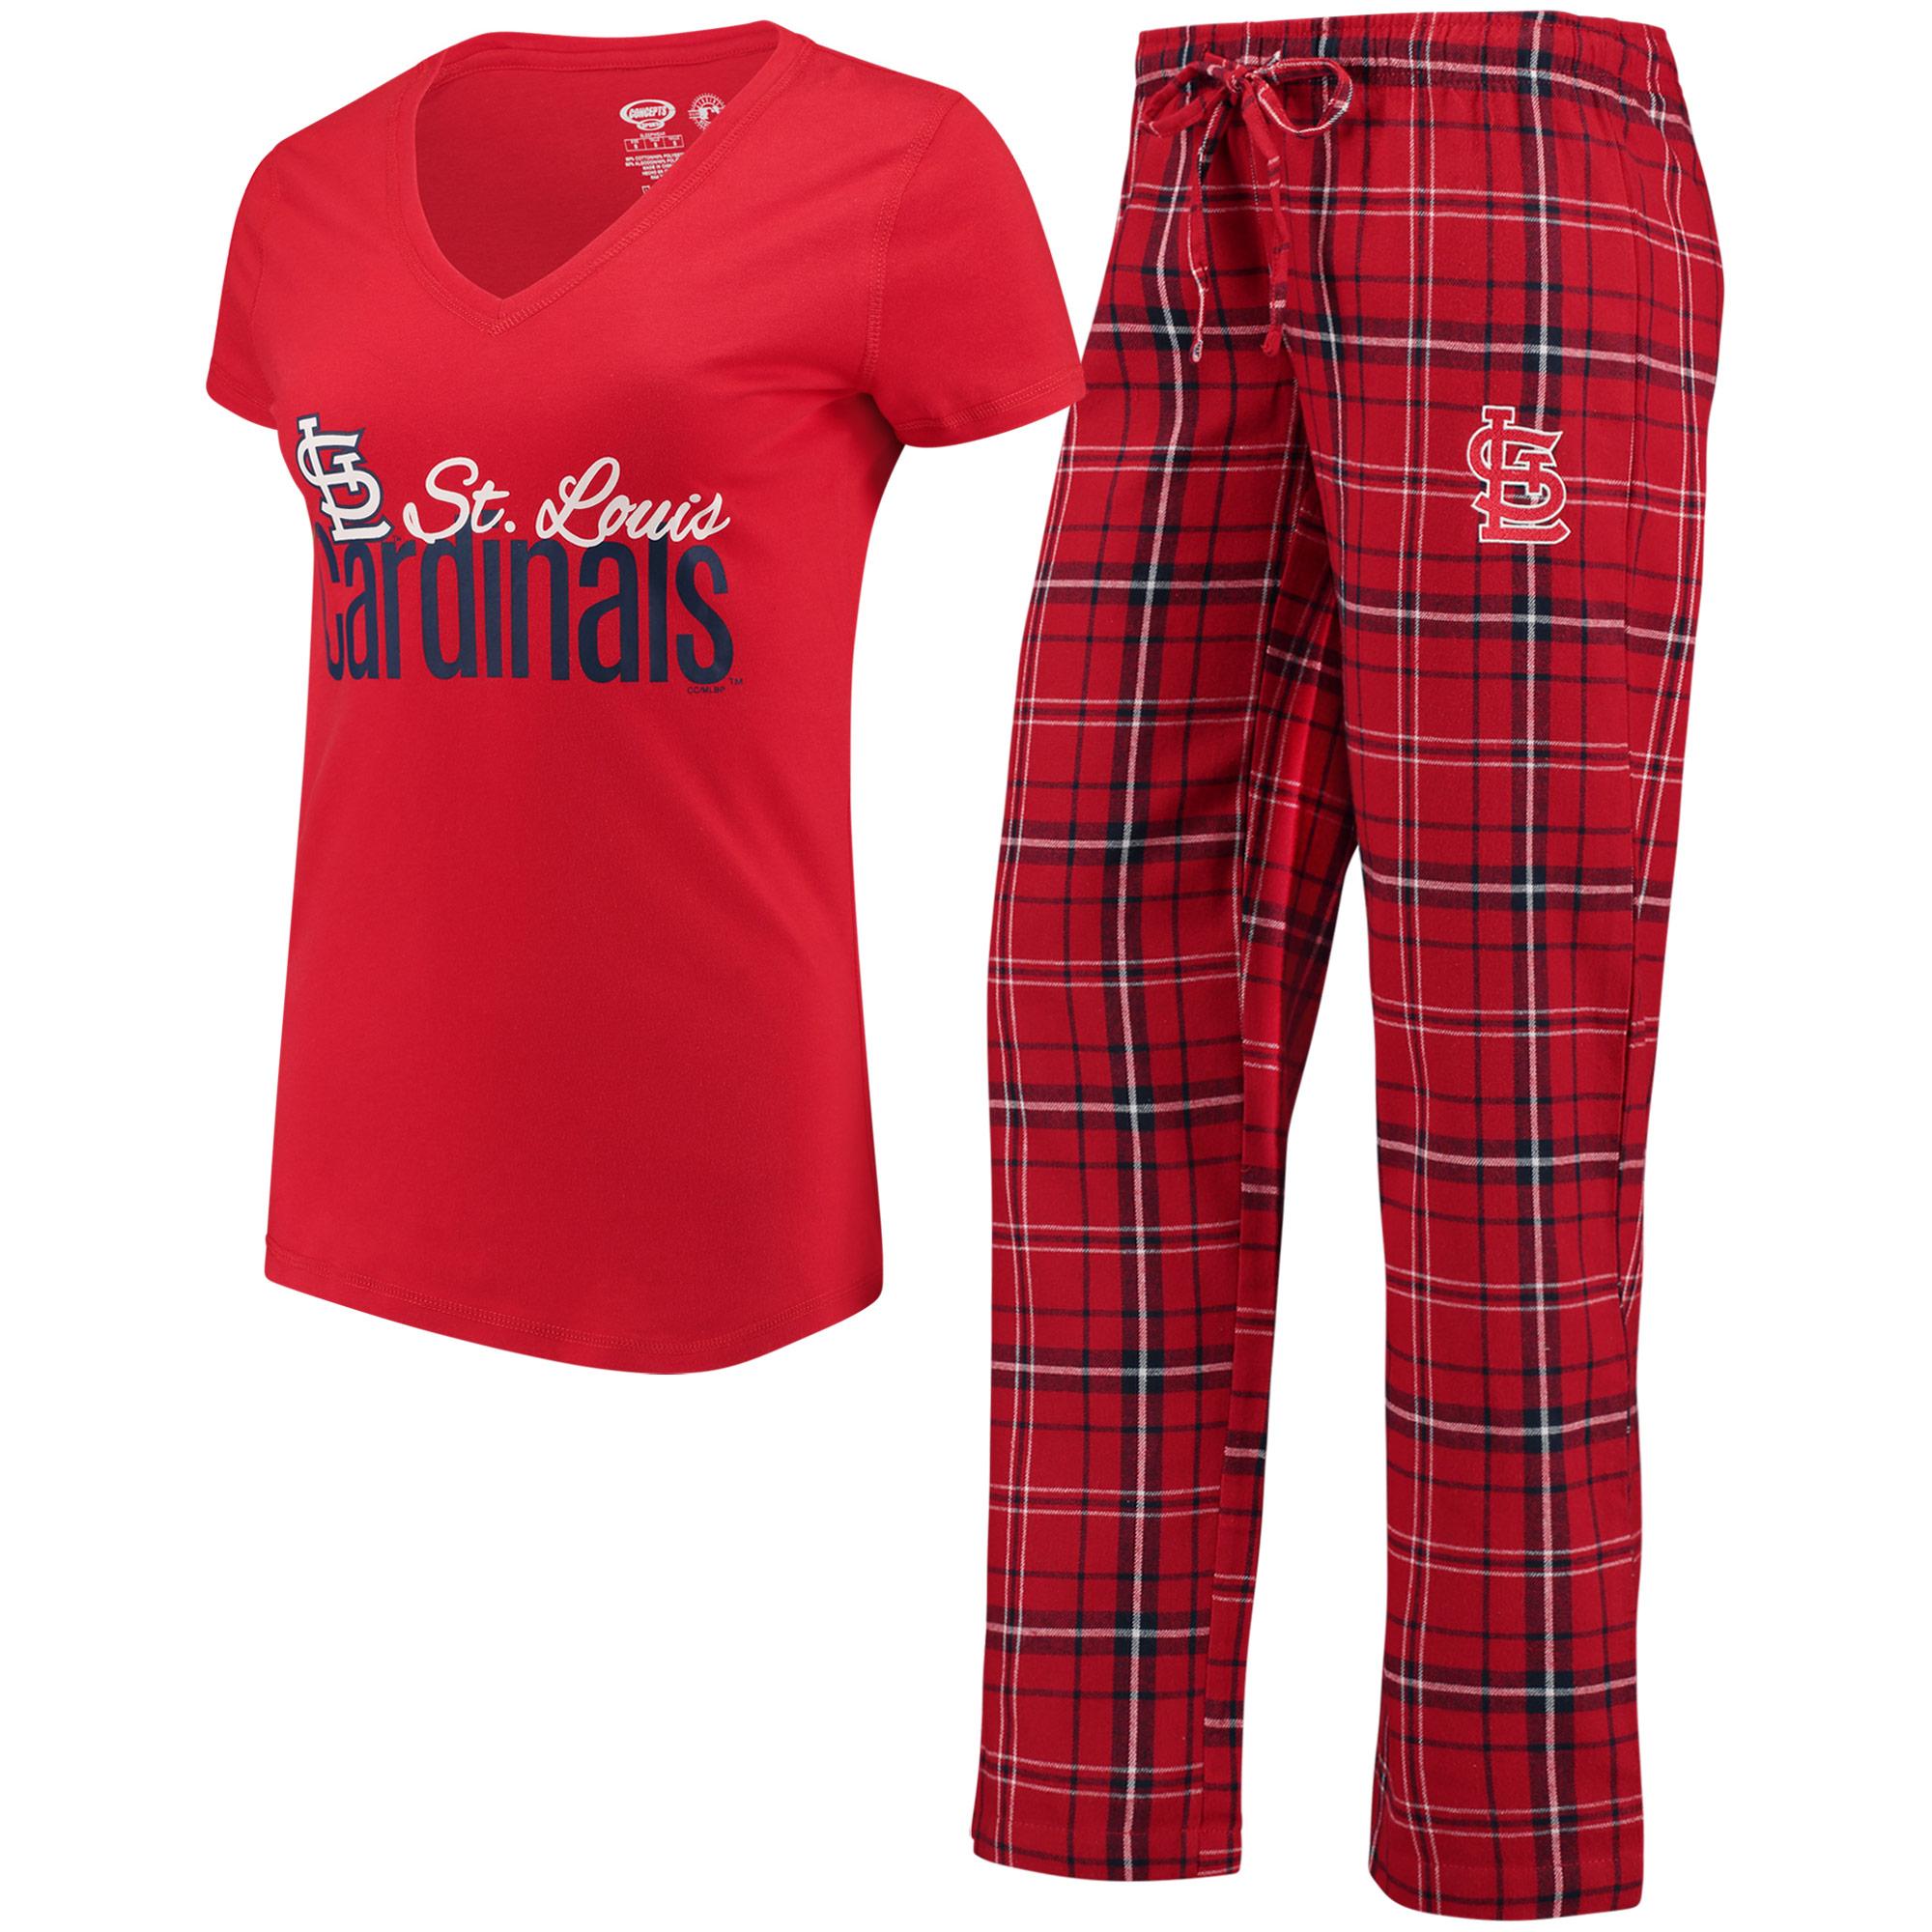 St. Louis Cardinals Womens Short Sleeve Top and Pant Sleep Set